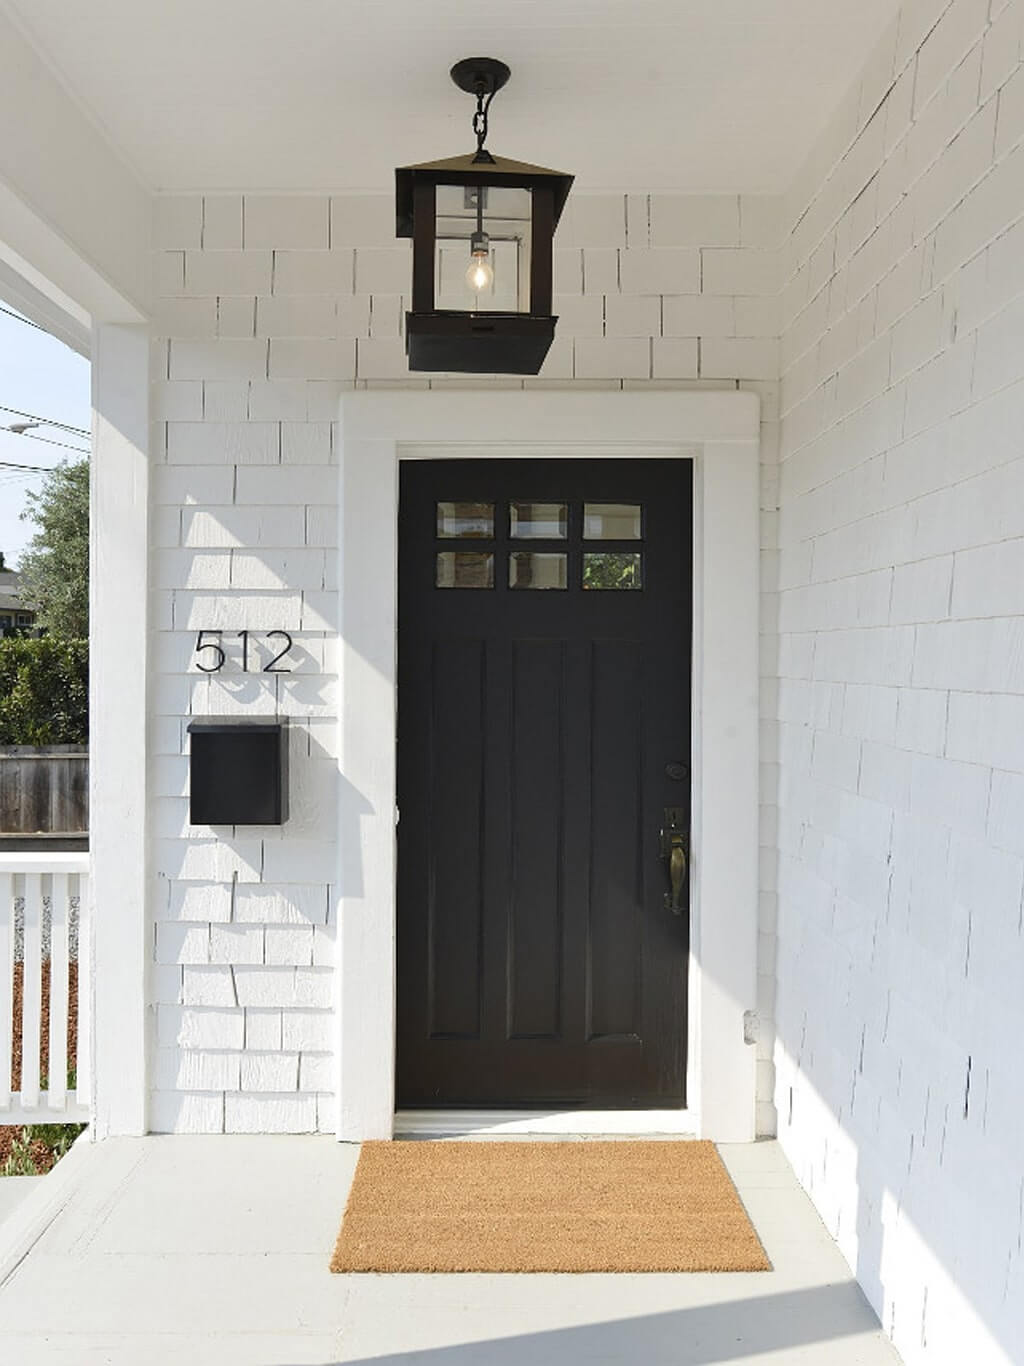 pintu depan berwarna hitam yang dipercaya membawa kesialan